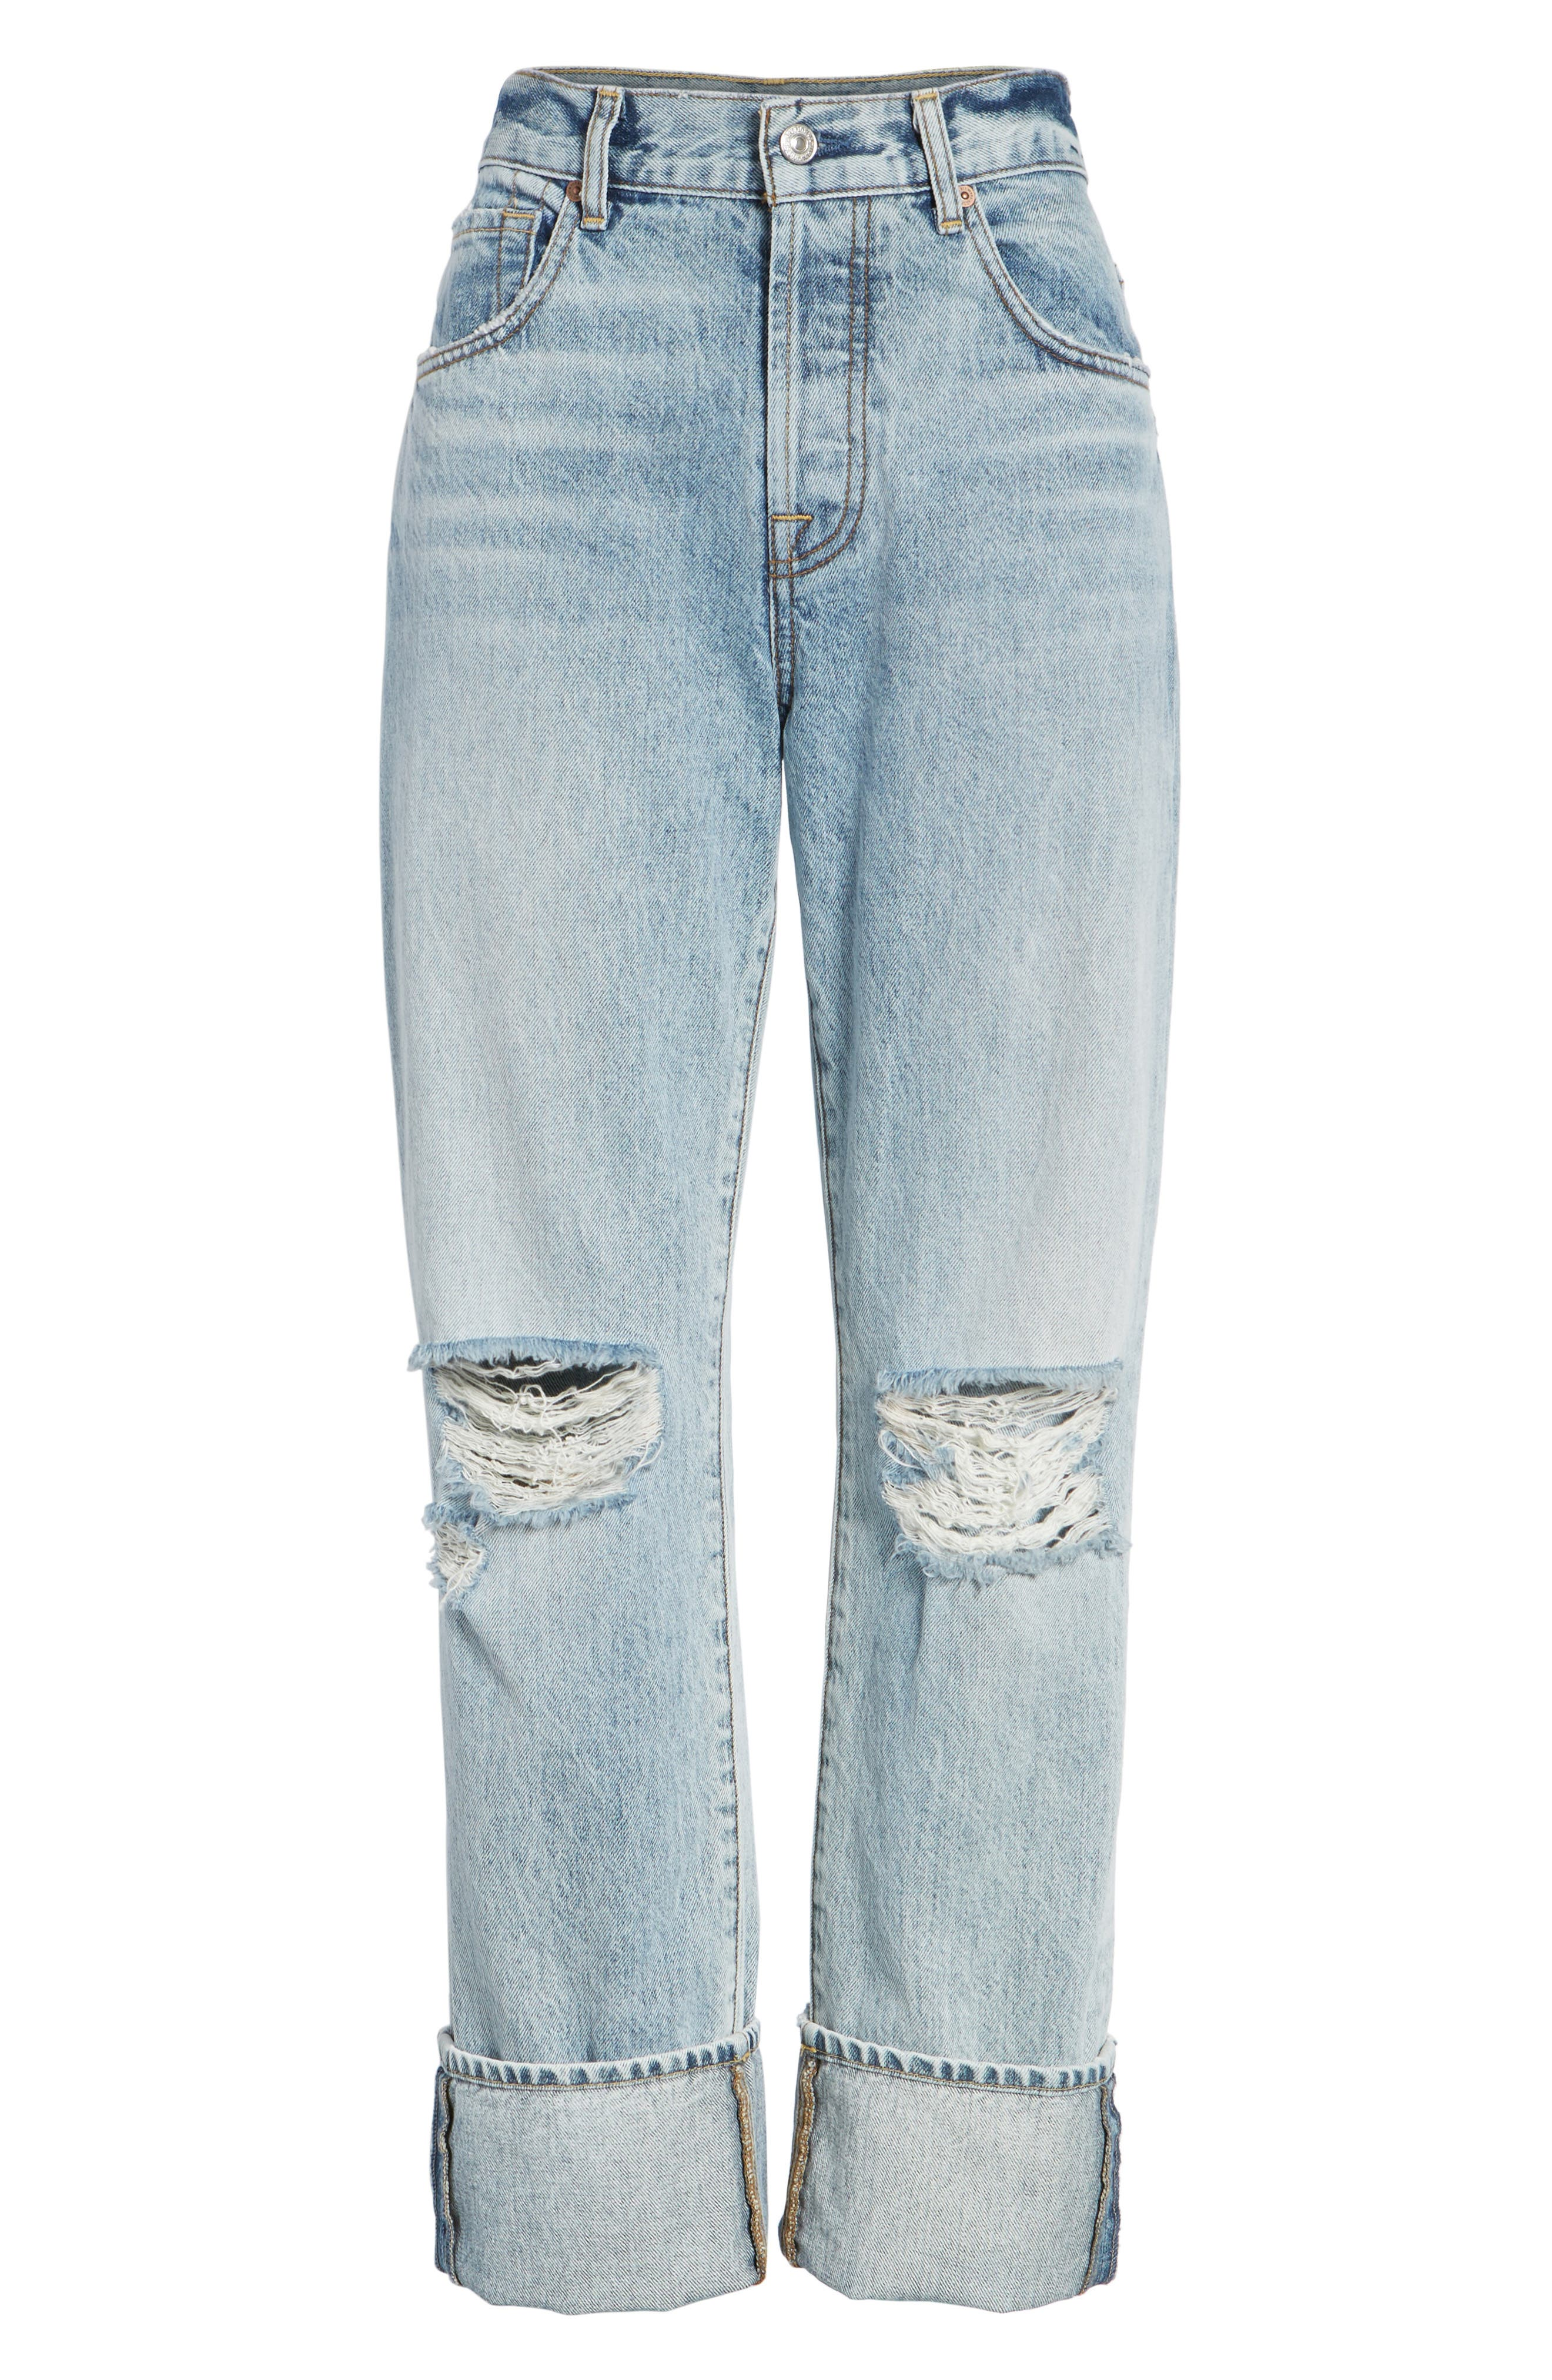 Rickie High Waist Boyfriend Jeans,                             Alternate thumbnail 7, color,                             Mineral Desert Springs 3